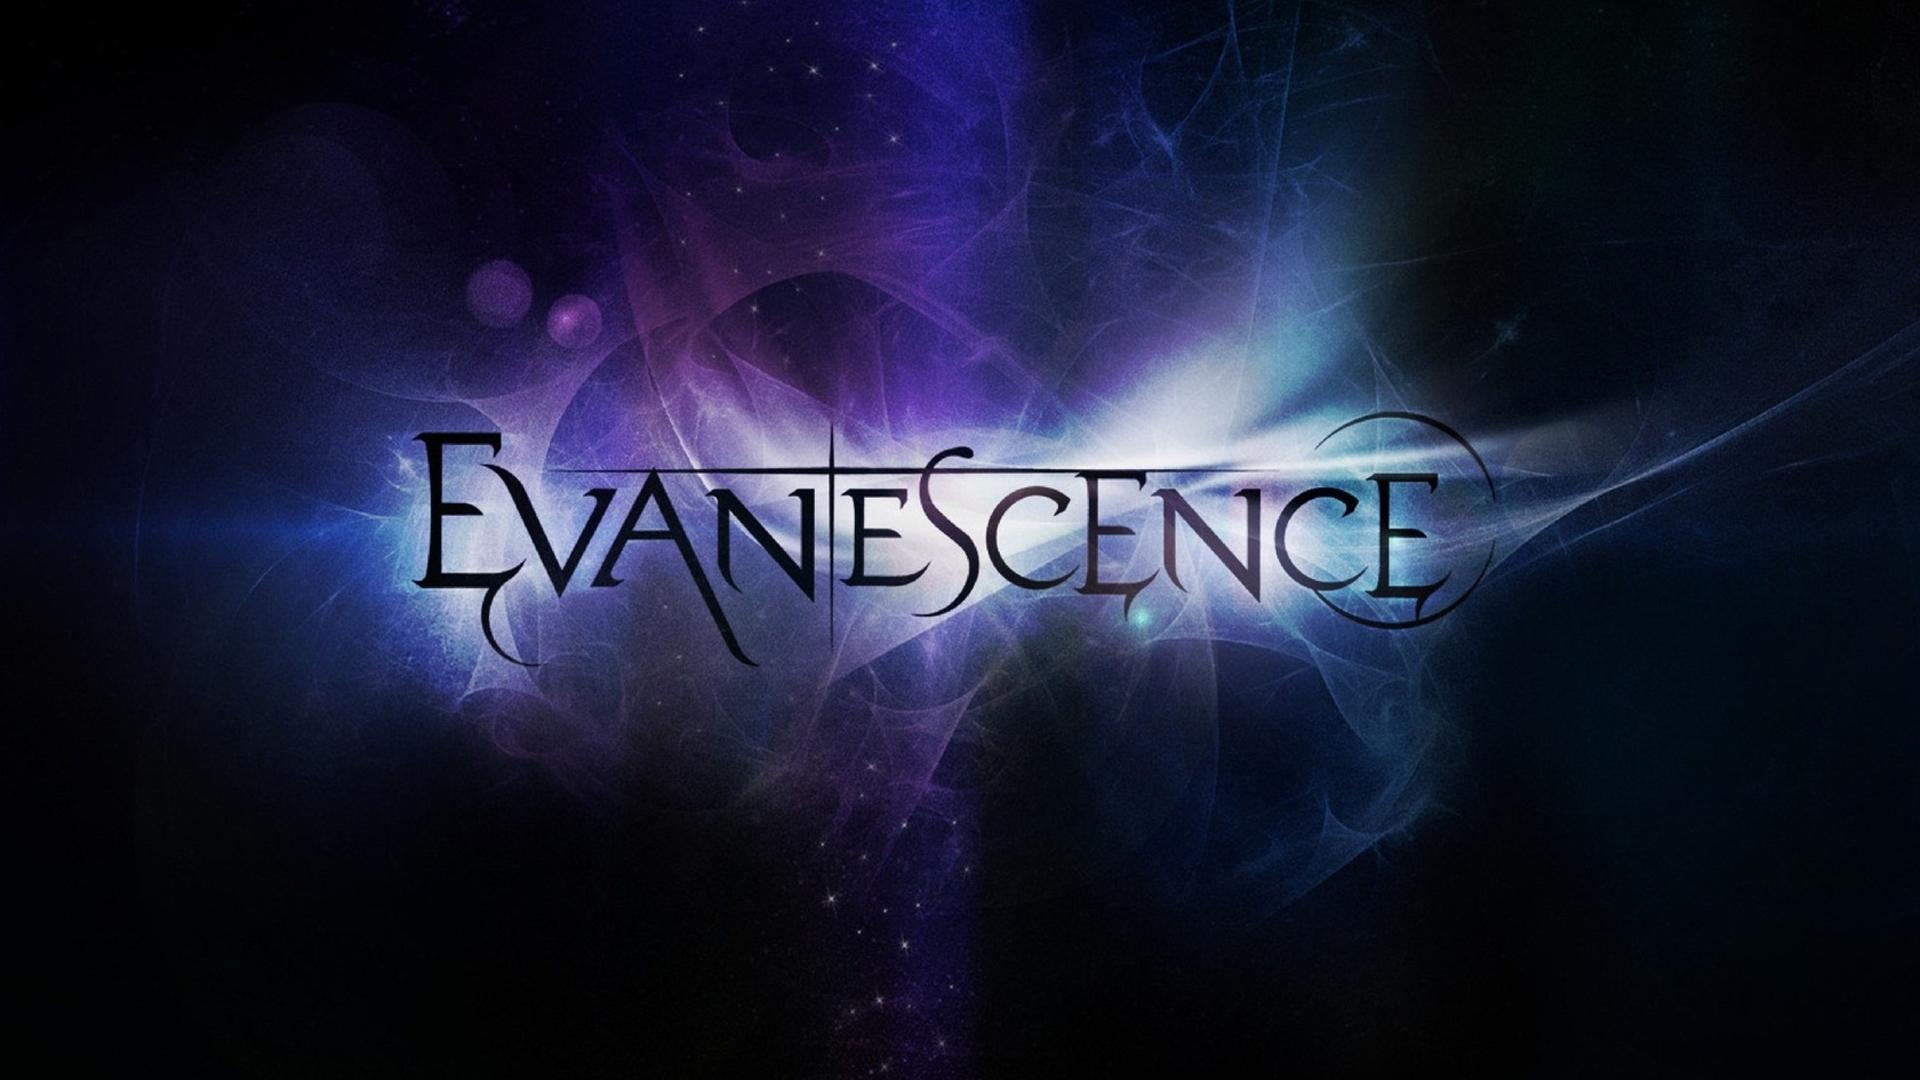 Evanescence Evanescence 2011 wallpaper   744081 1920x1080